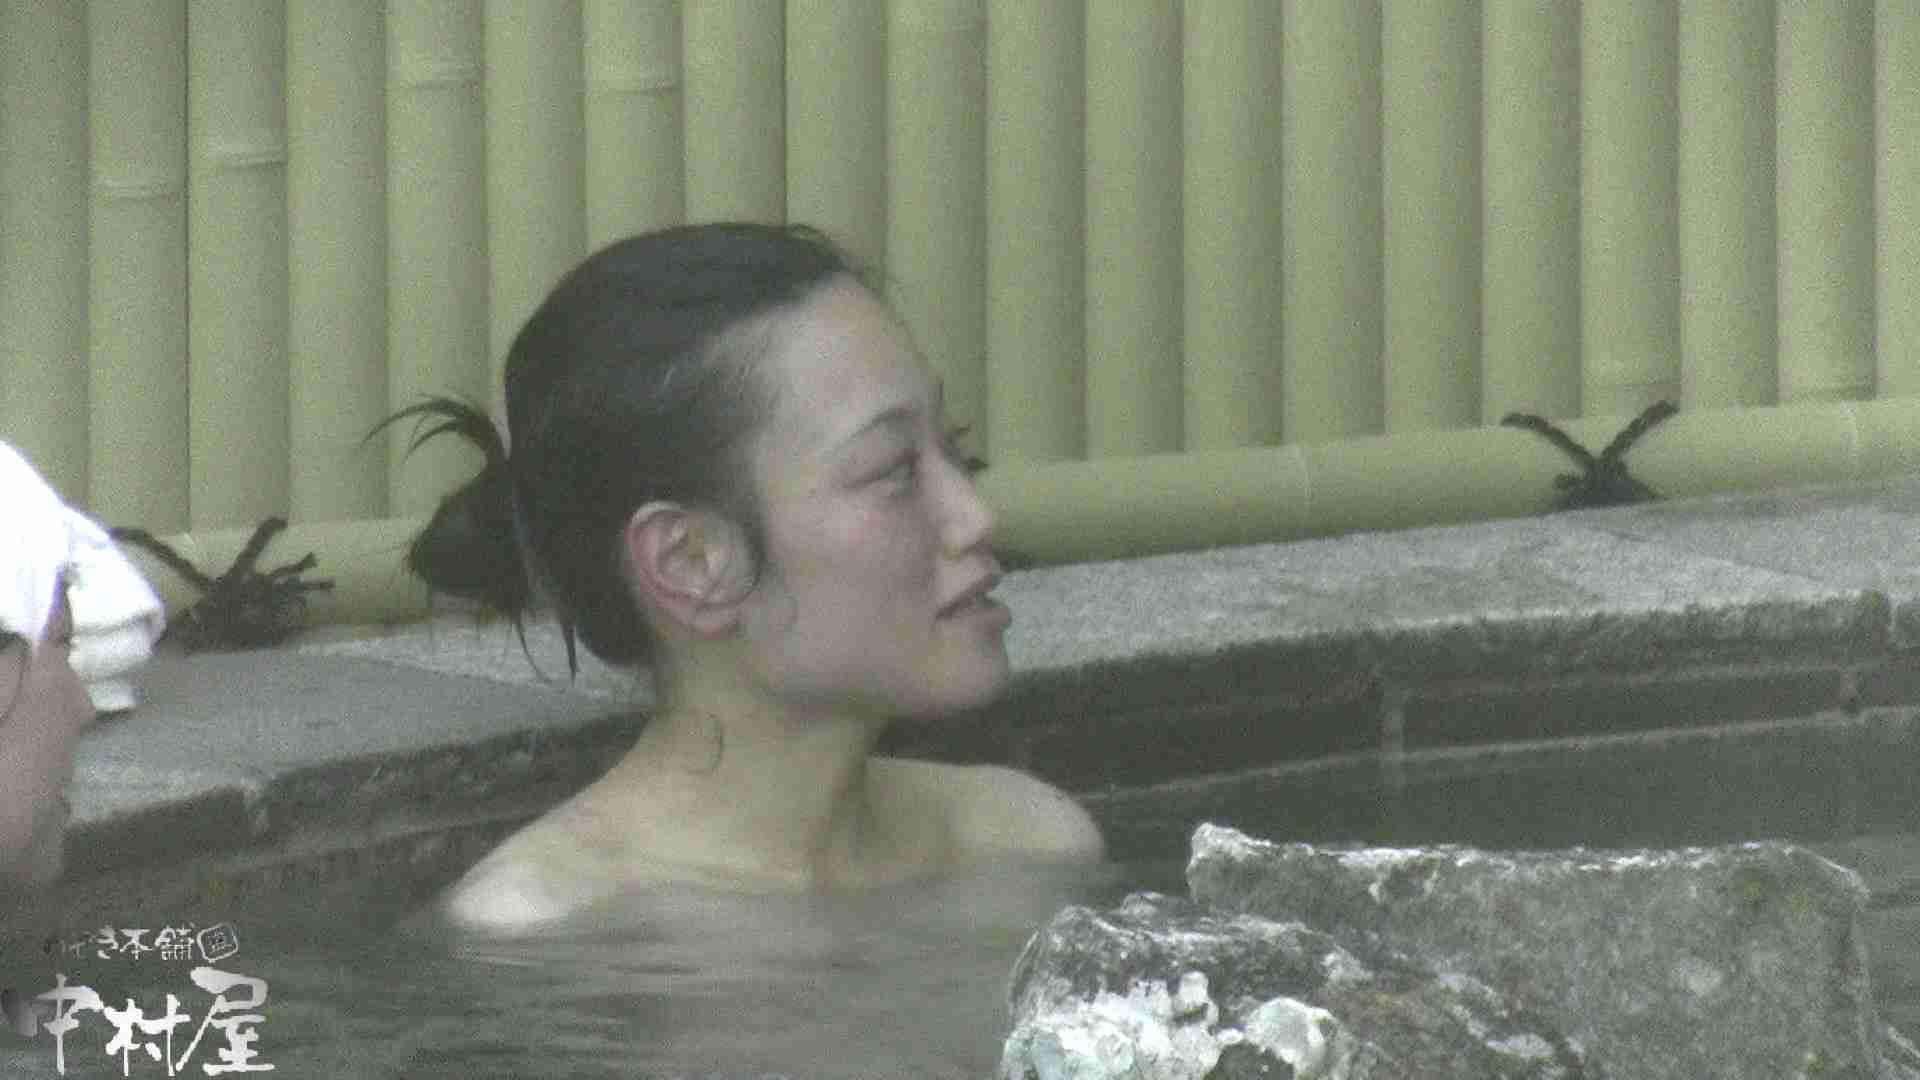 Aquaな露天風呂Vol.914 露天風呂編  83PIX 62